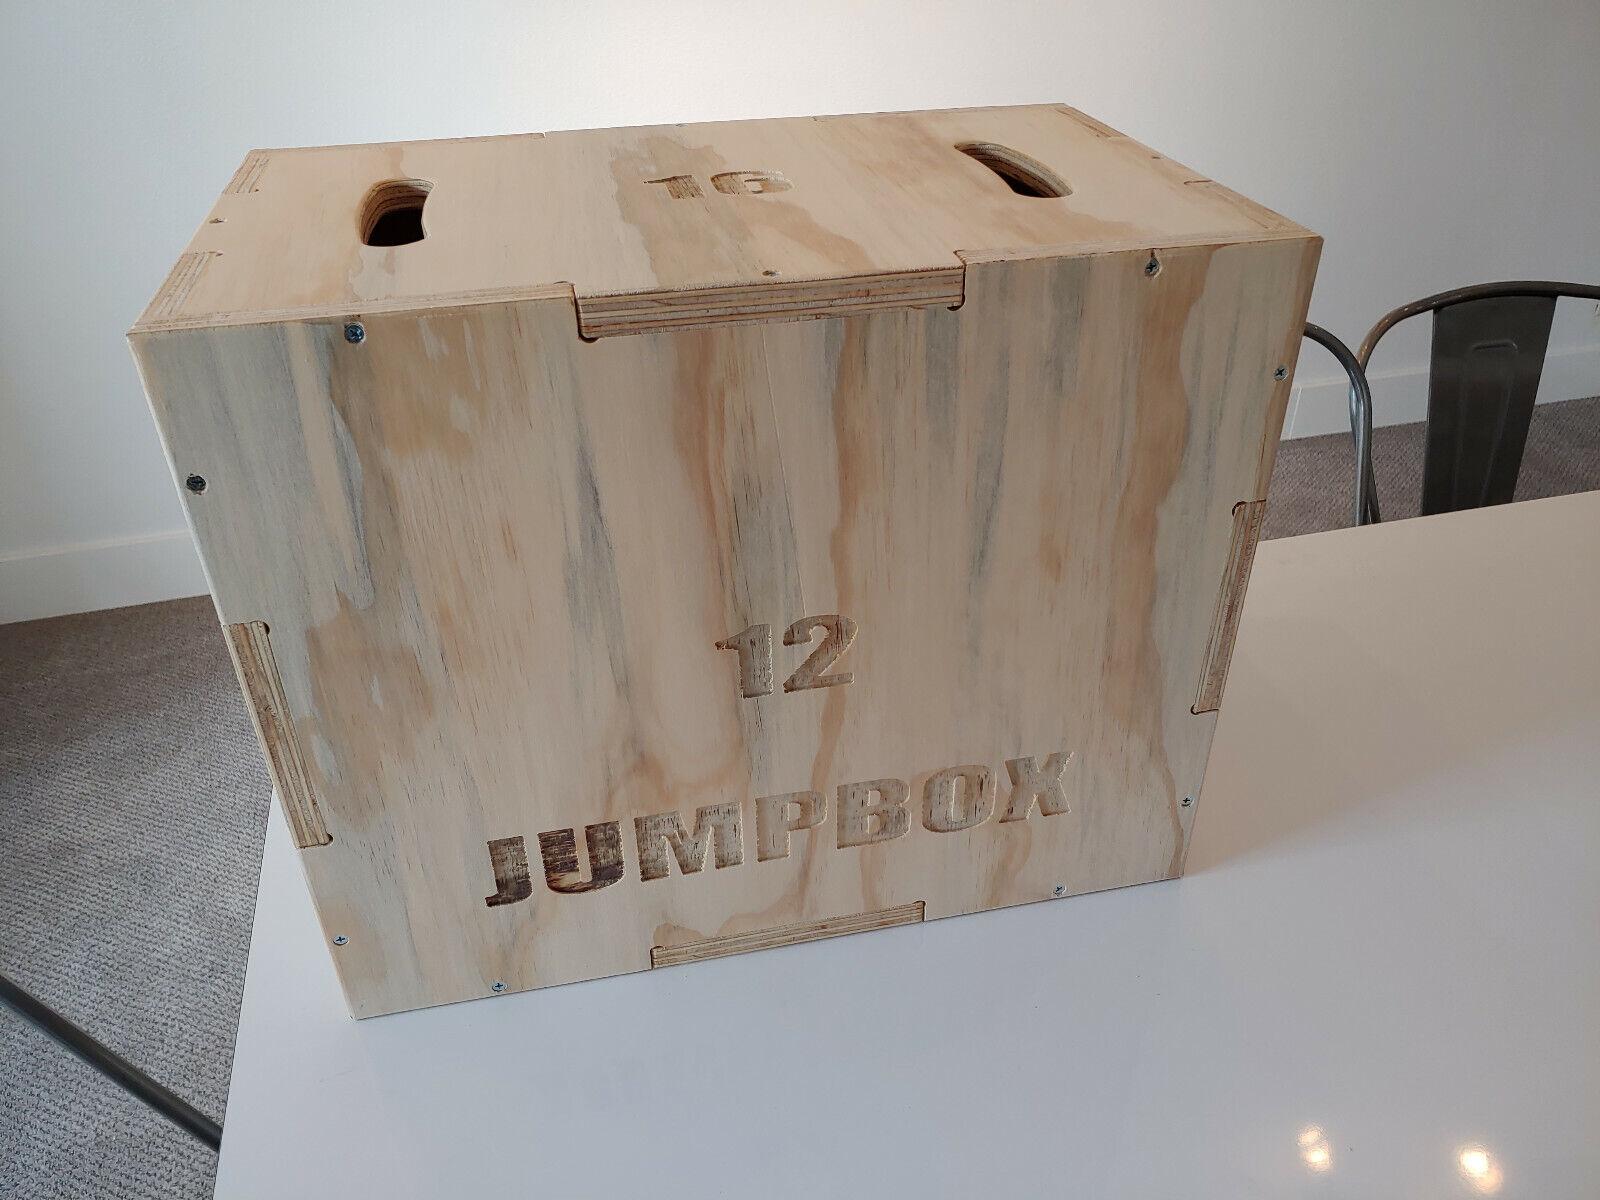 Plyo Box 12x16x20 - Plyometric Box - Crossfit - MMA Training